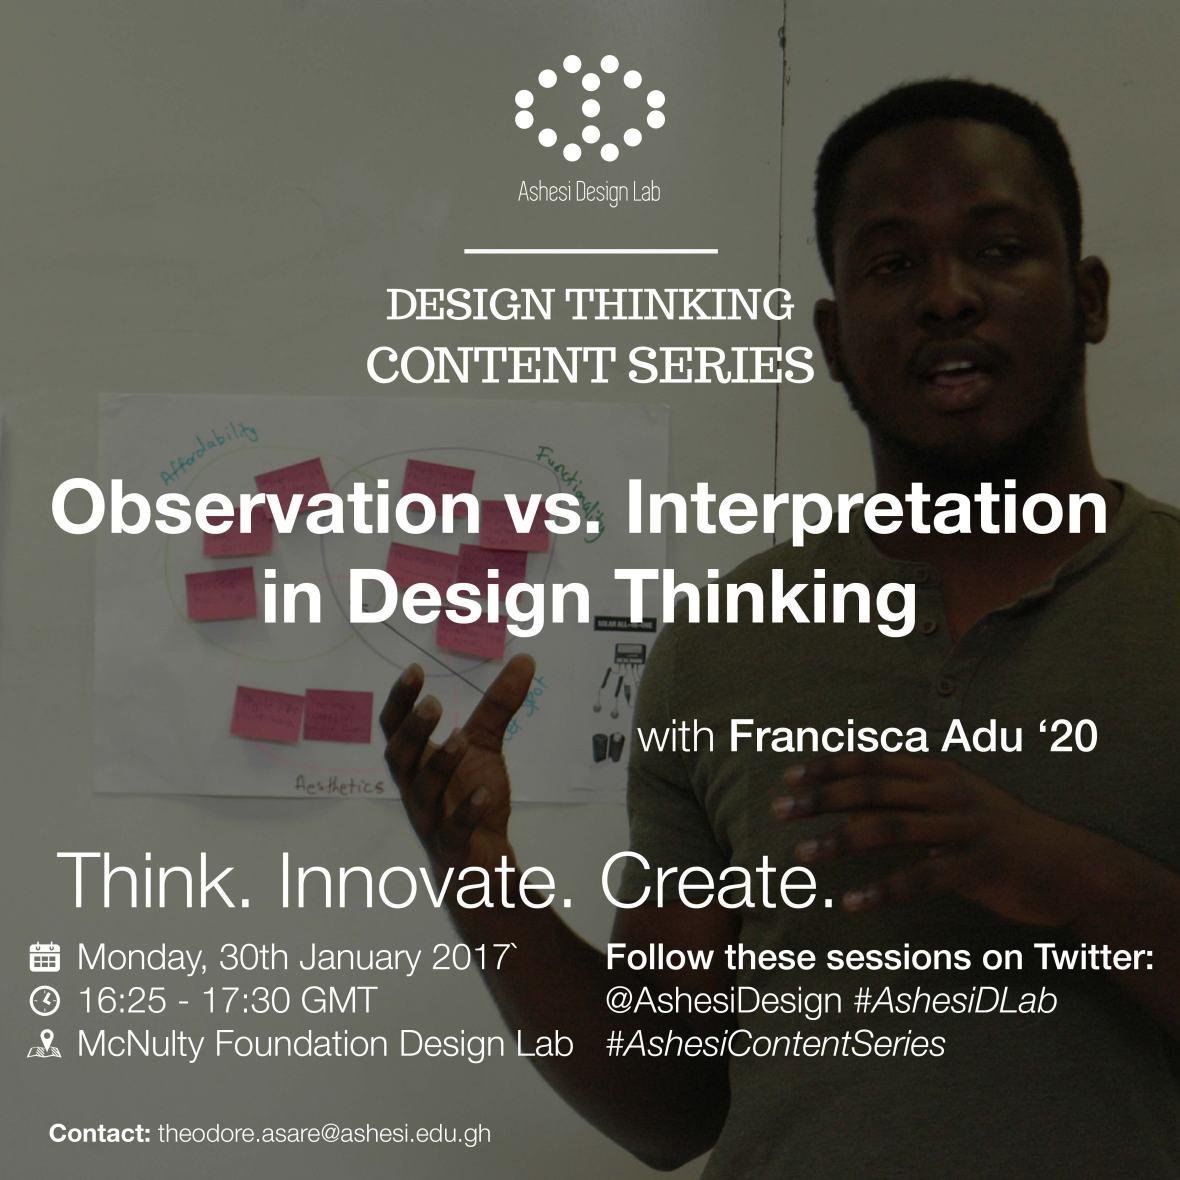 ashesi-dlab-content-series-observation-vs-interpretation-01